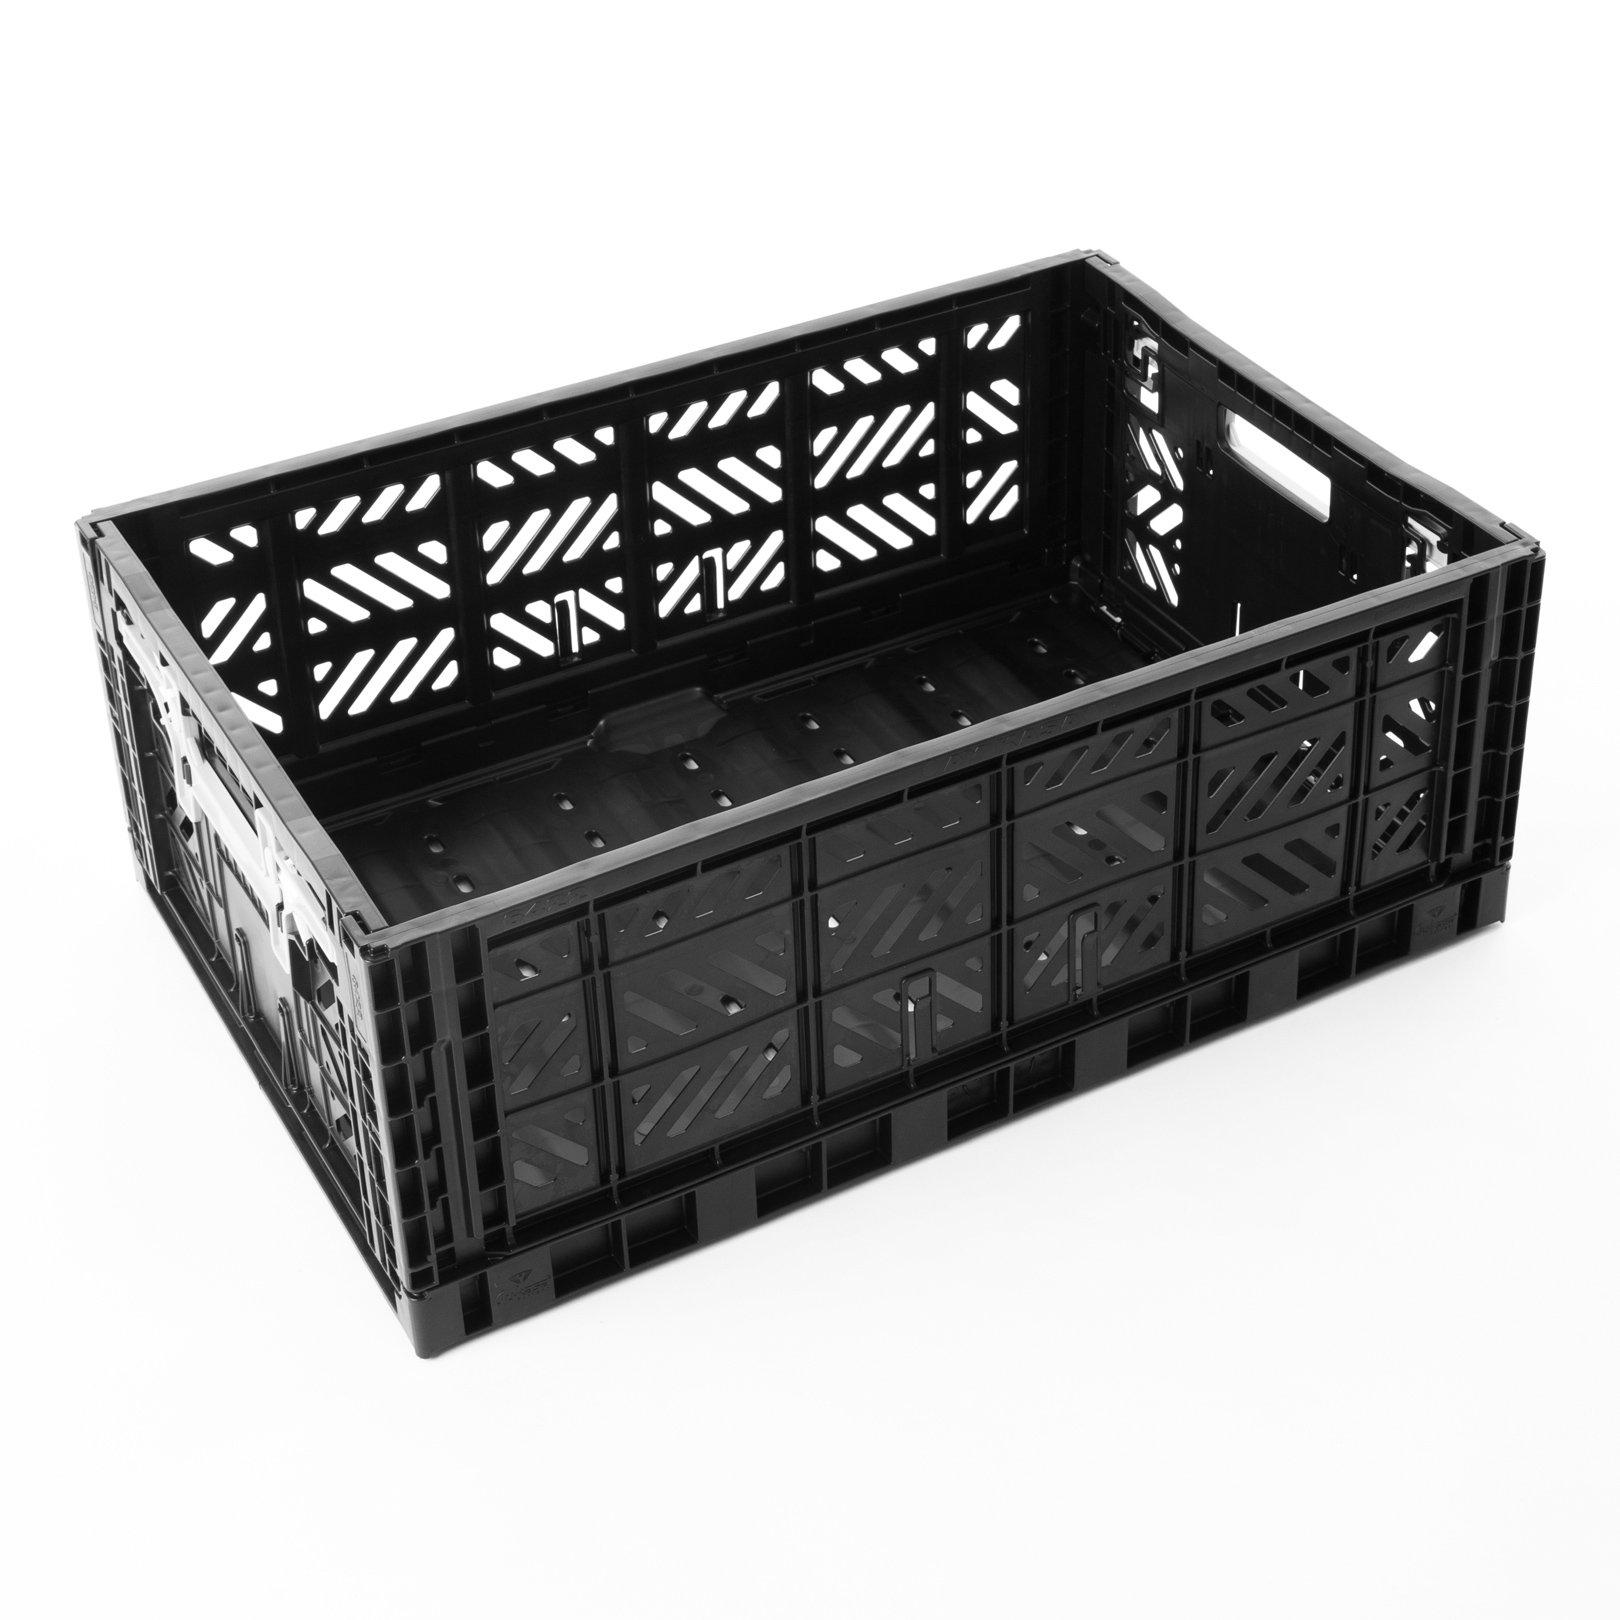 AY-KASA Collapsible Storage Bin Container Basket Tote , Folding Basket CRATE Container : Storage , Kitchen , Houseware Utility Basket Tote Crate = Maxi-BOX COMFORT LOCK ( BLACK )